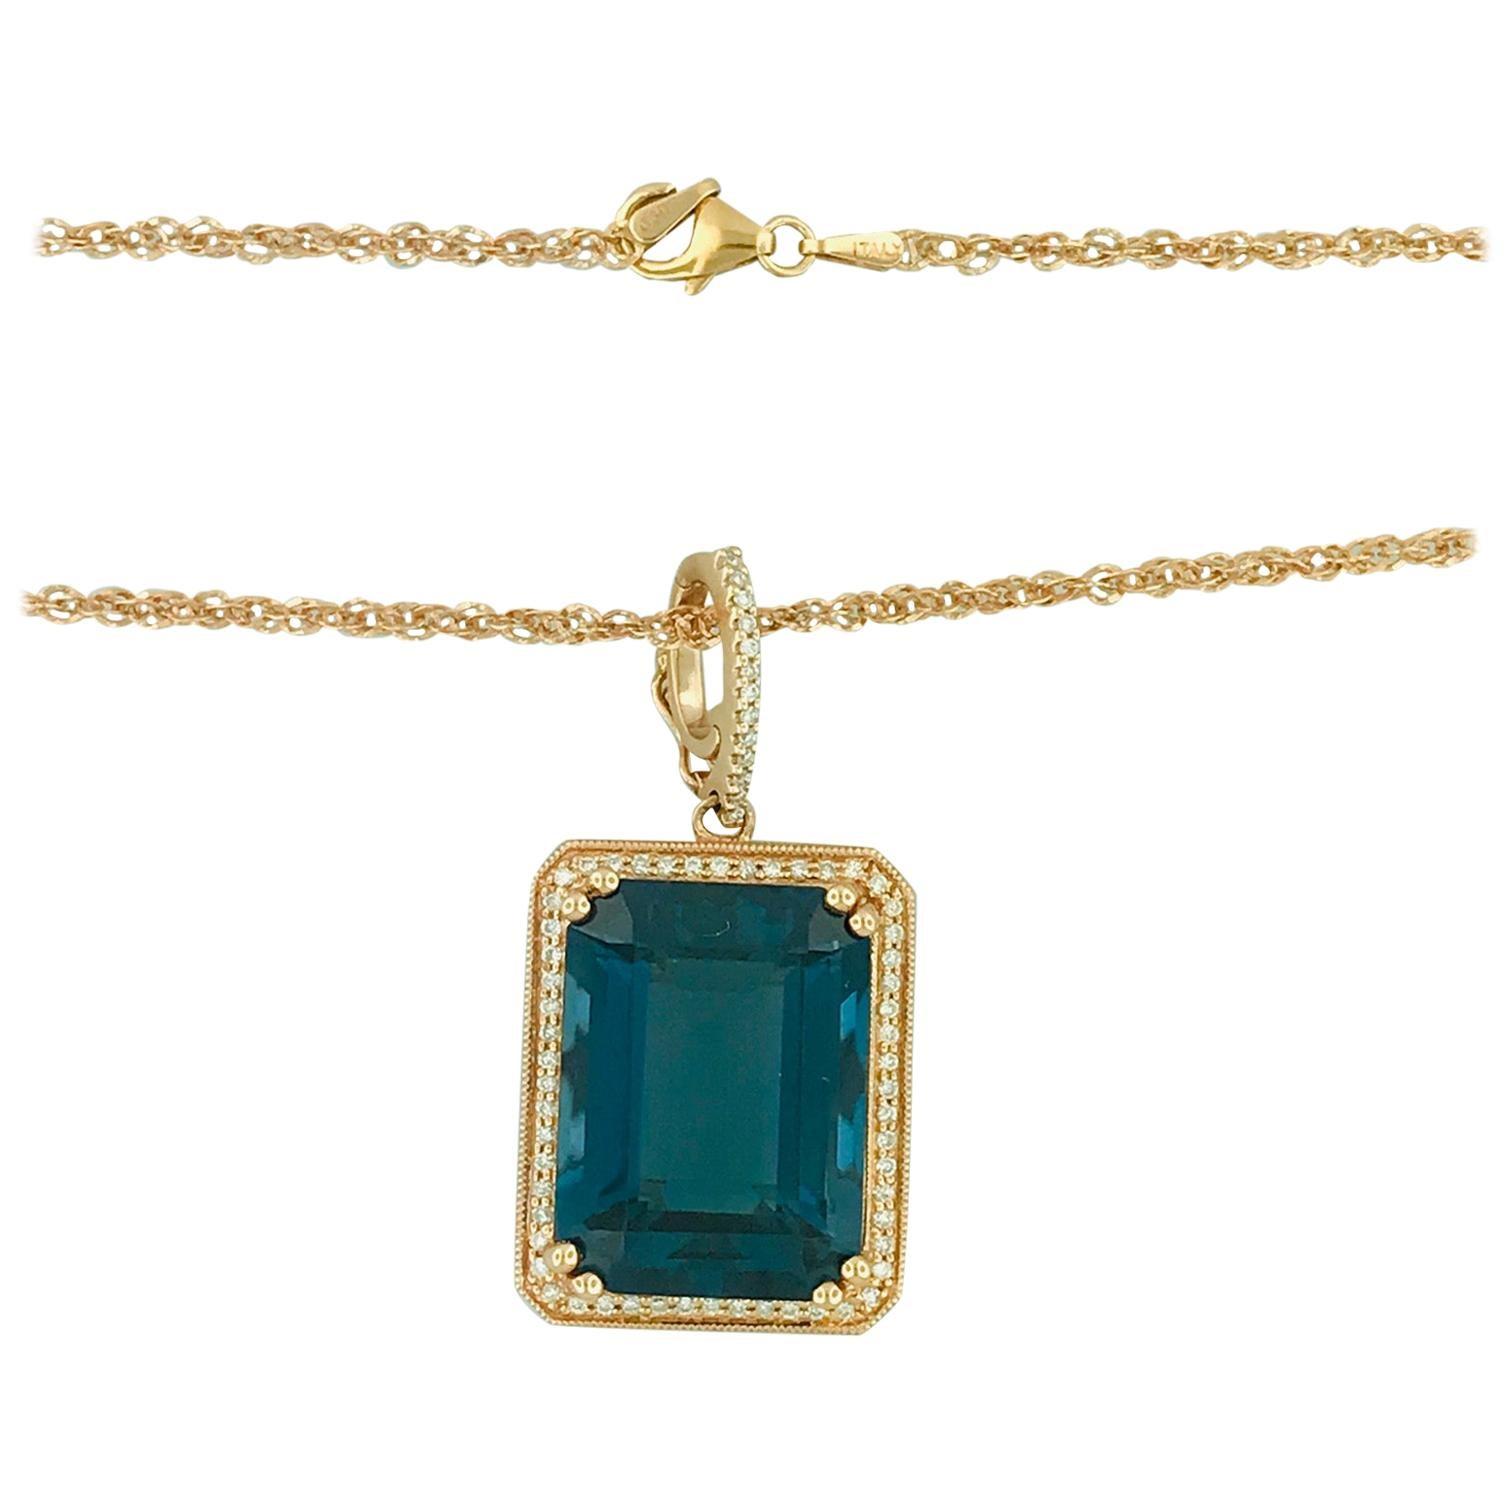 29 Carat Royal Blue Topaz .60 Carat Diamond Rose Gold Necklace Pendant Enhancer